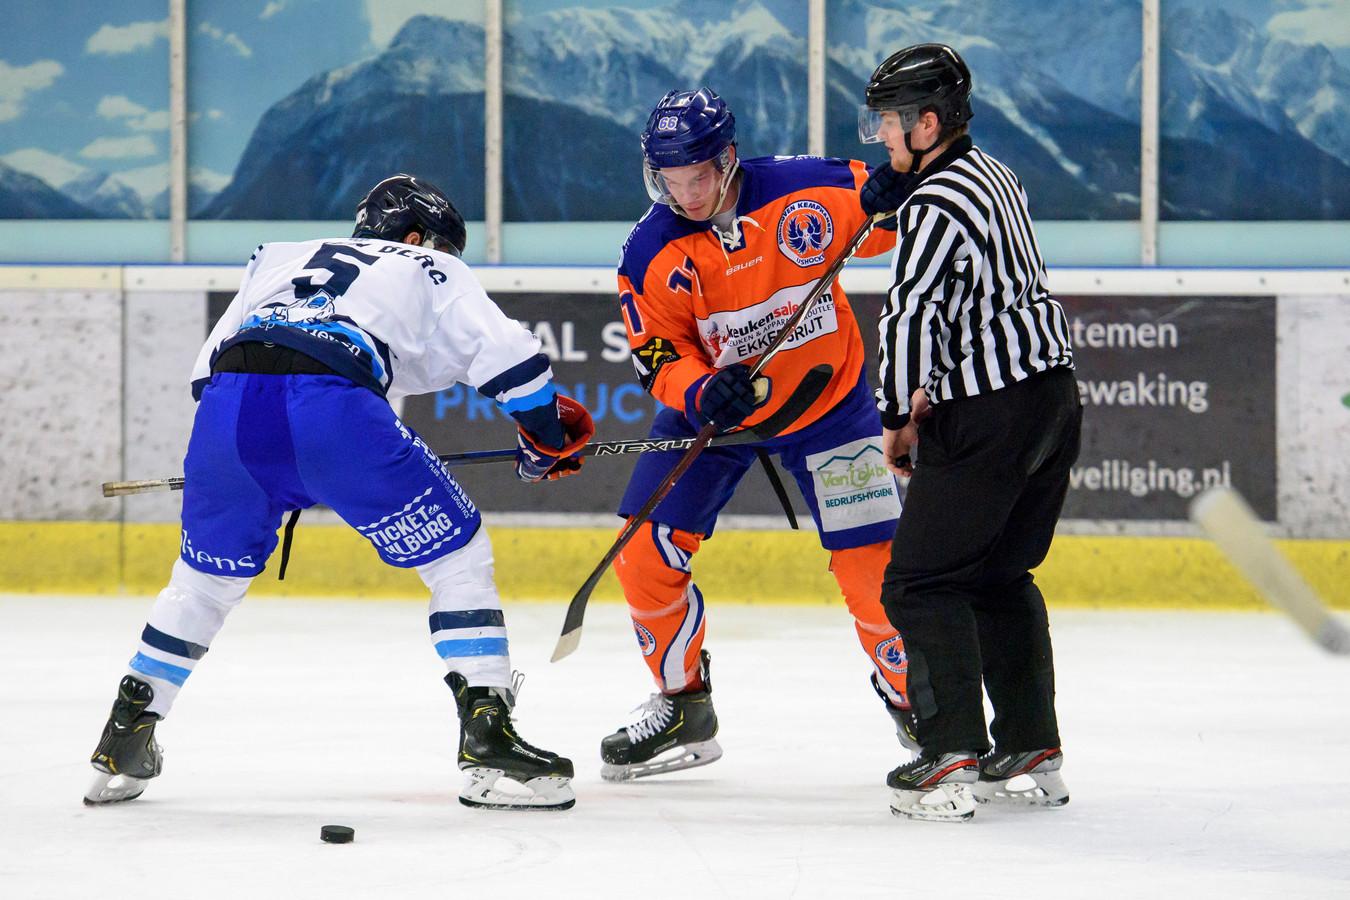 Yeti's Breda speelt in het blauw/wit.